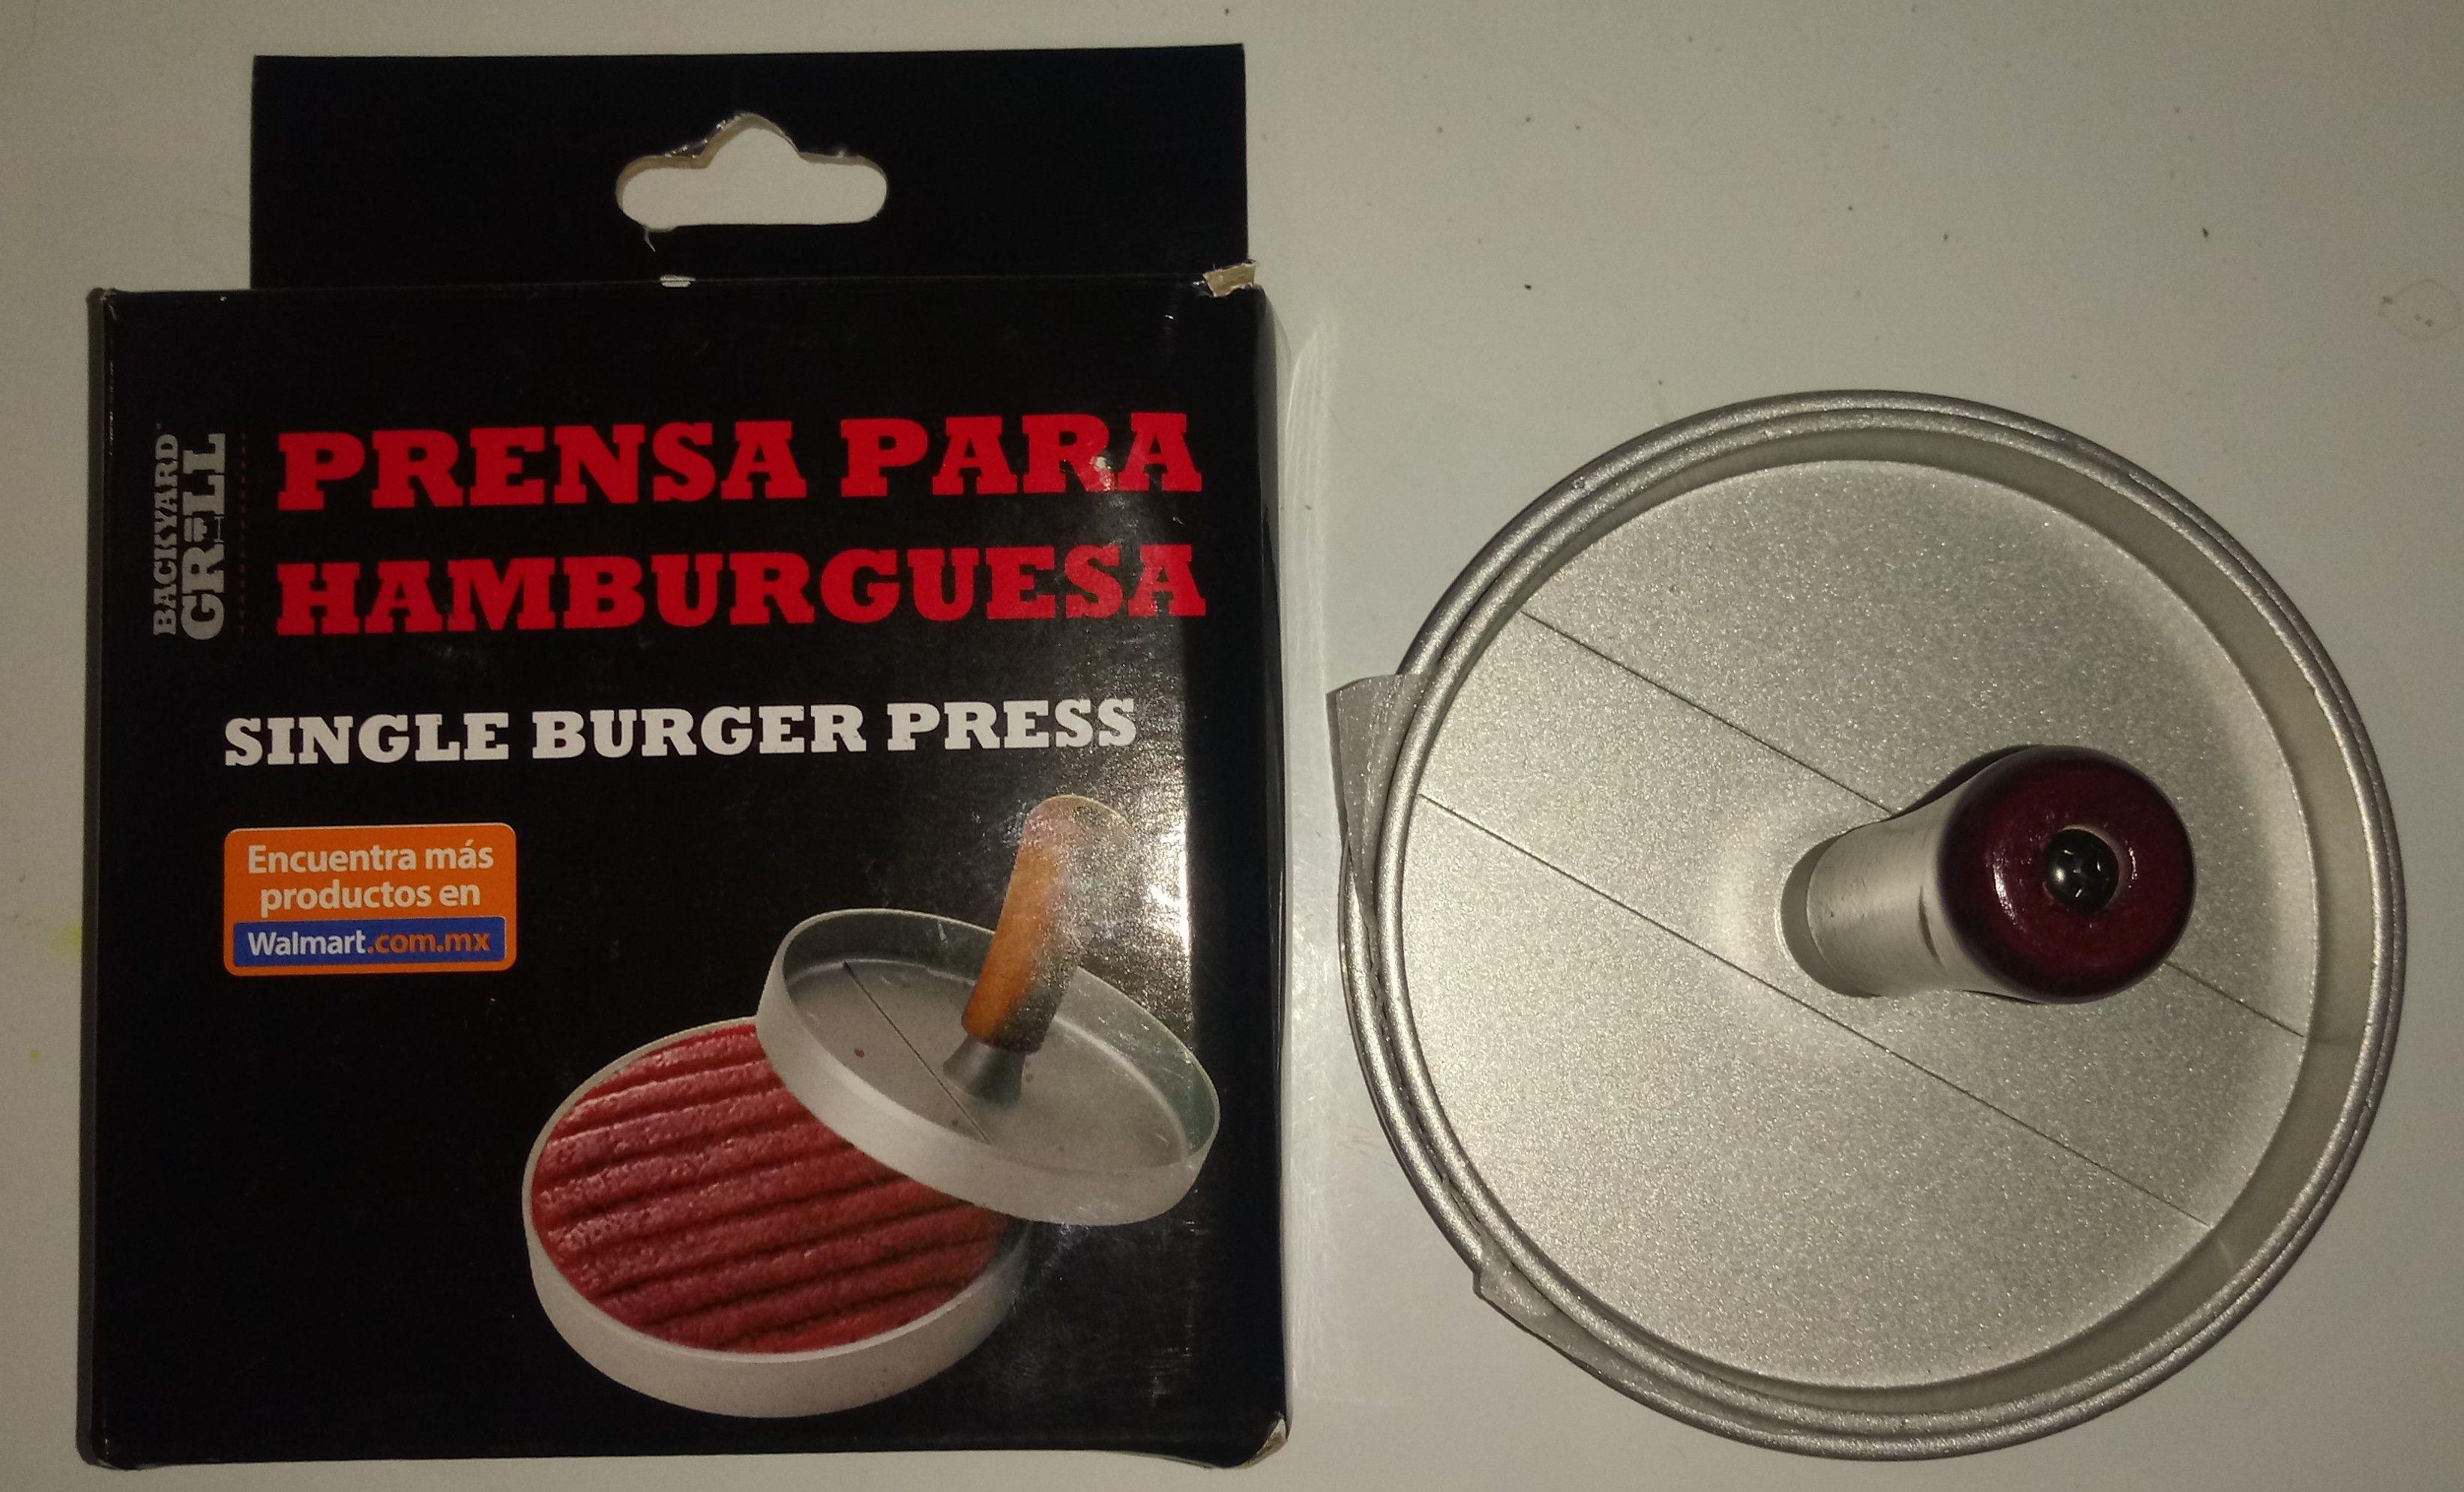 Bodega Aurrera Villa Juarez: Prensa para carnes de hamburguesa